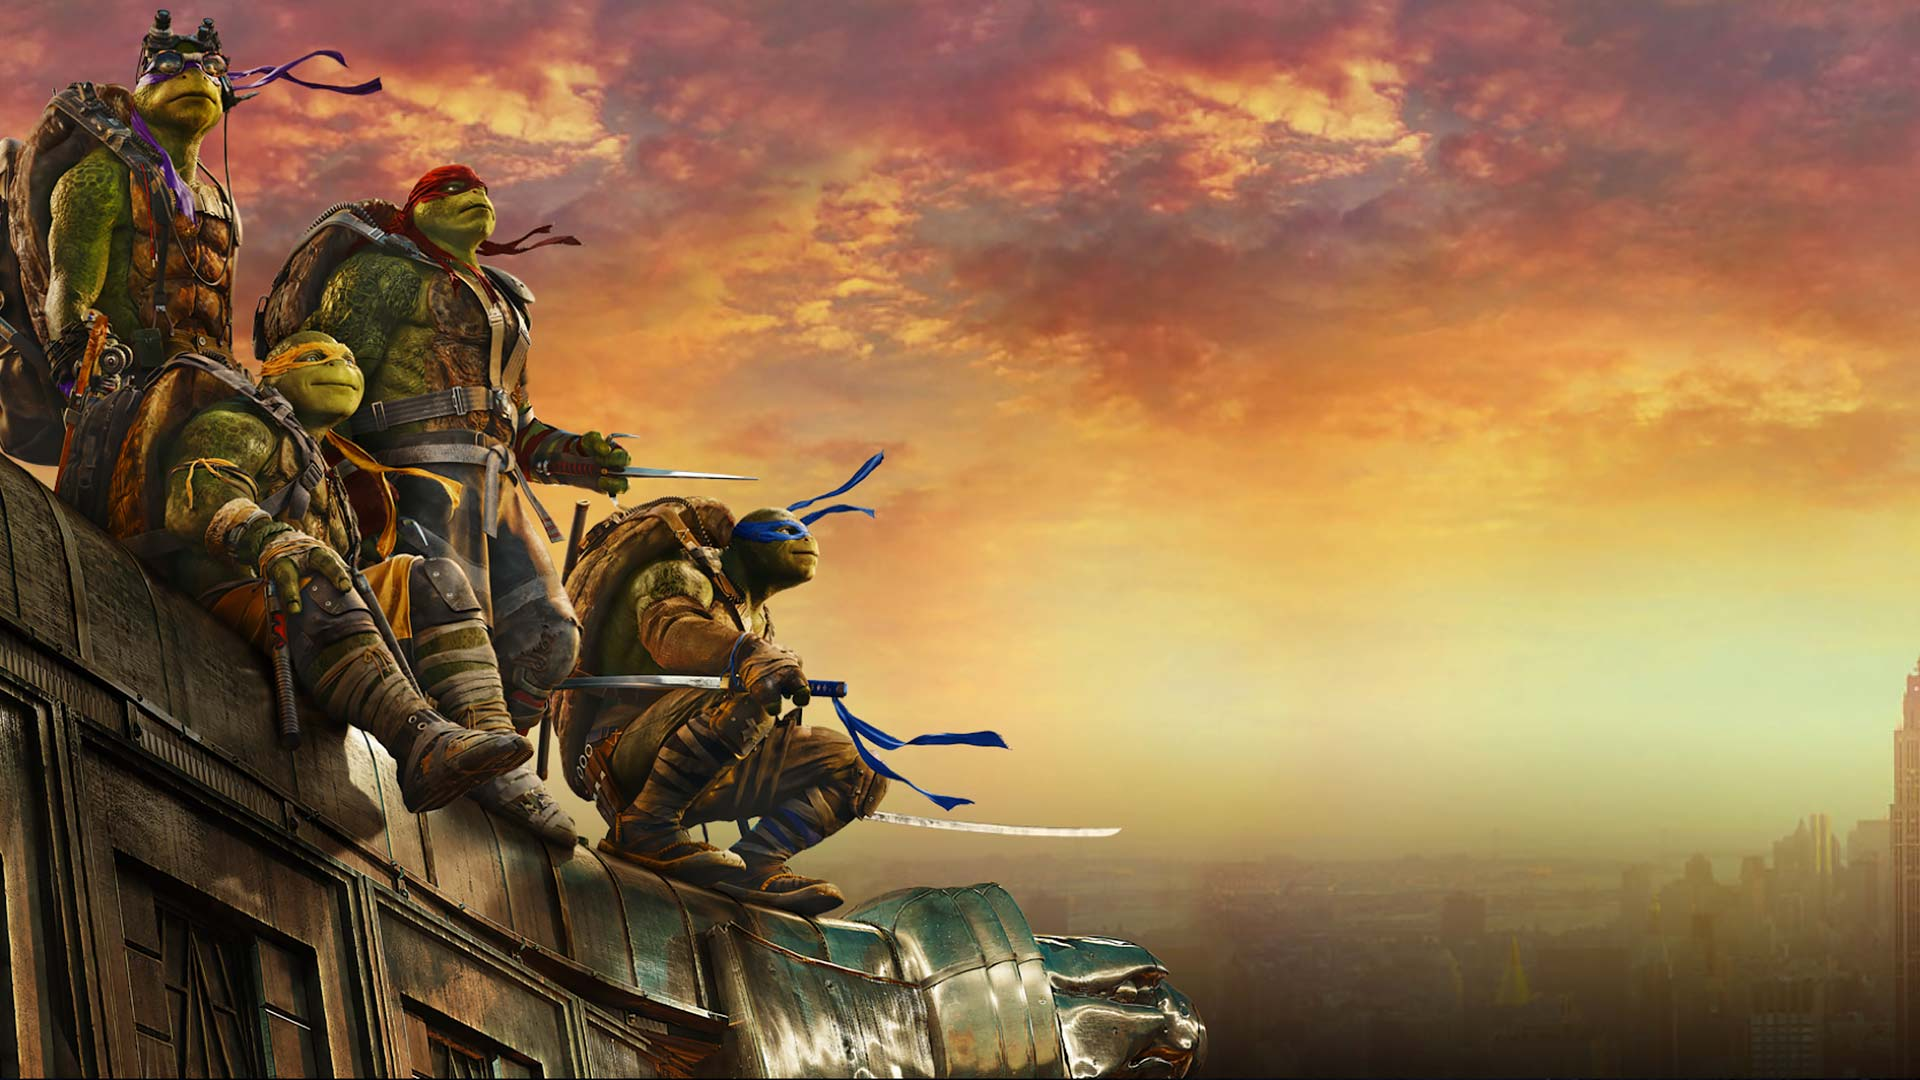 Most Viewed Teenage Mutant Ninja Turtles Out Of The Shadows